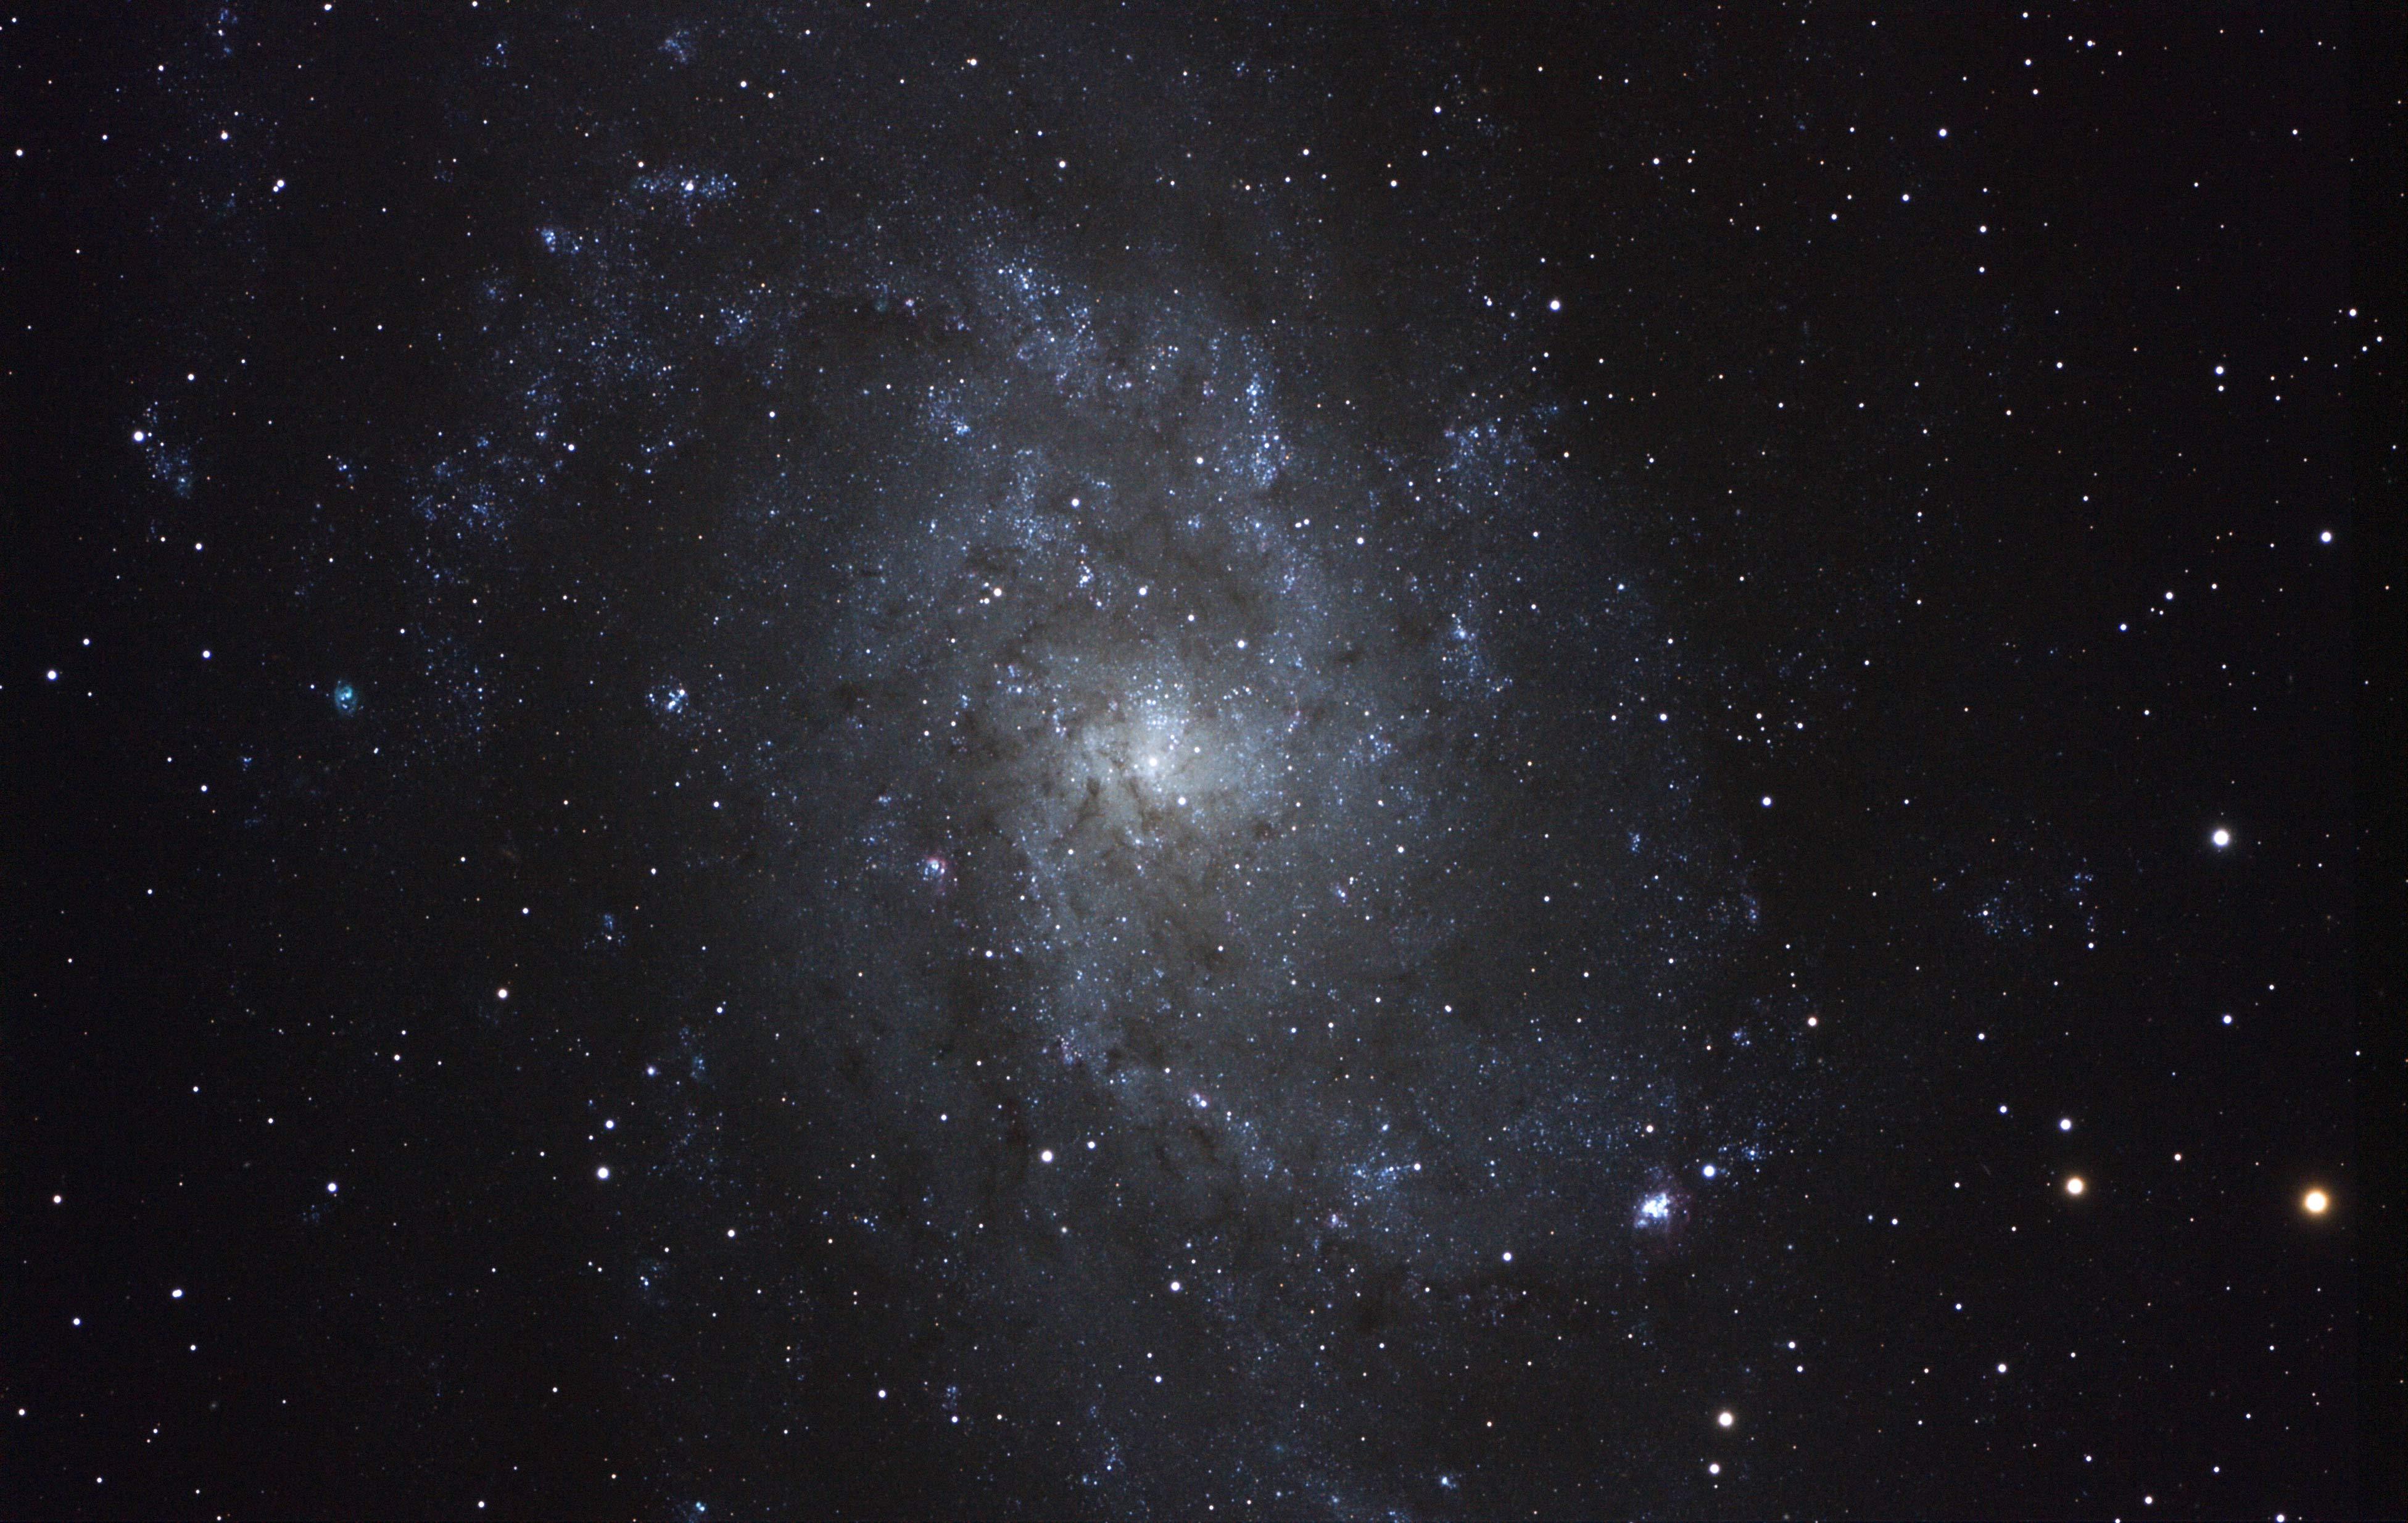 M33 full resolution